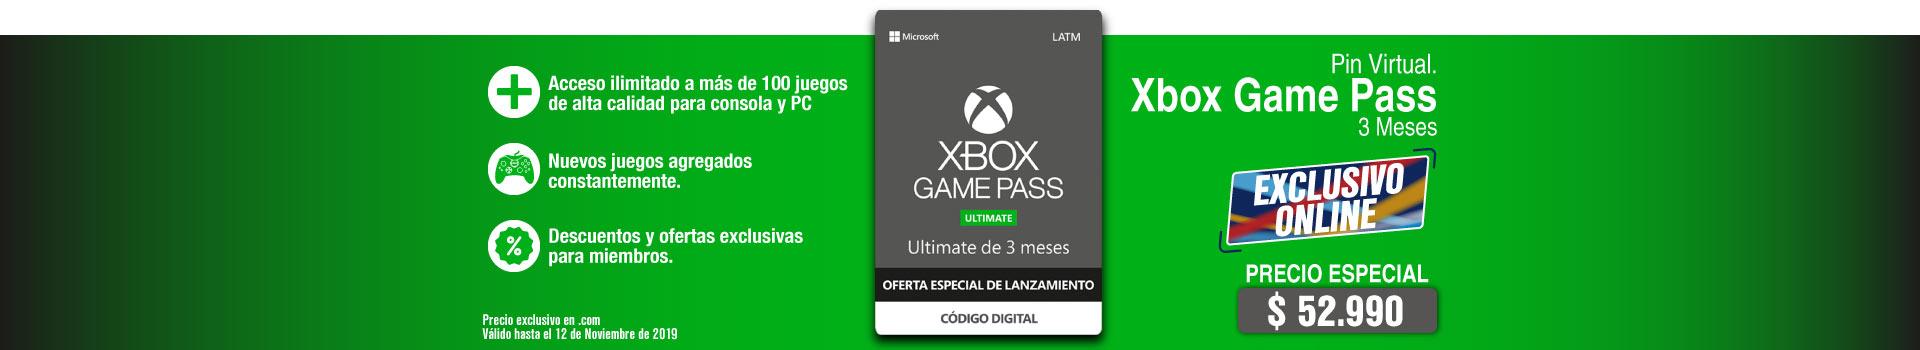 pin-virtual-xbox-game-pass-3-meses